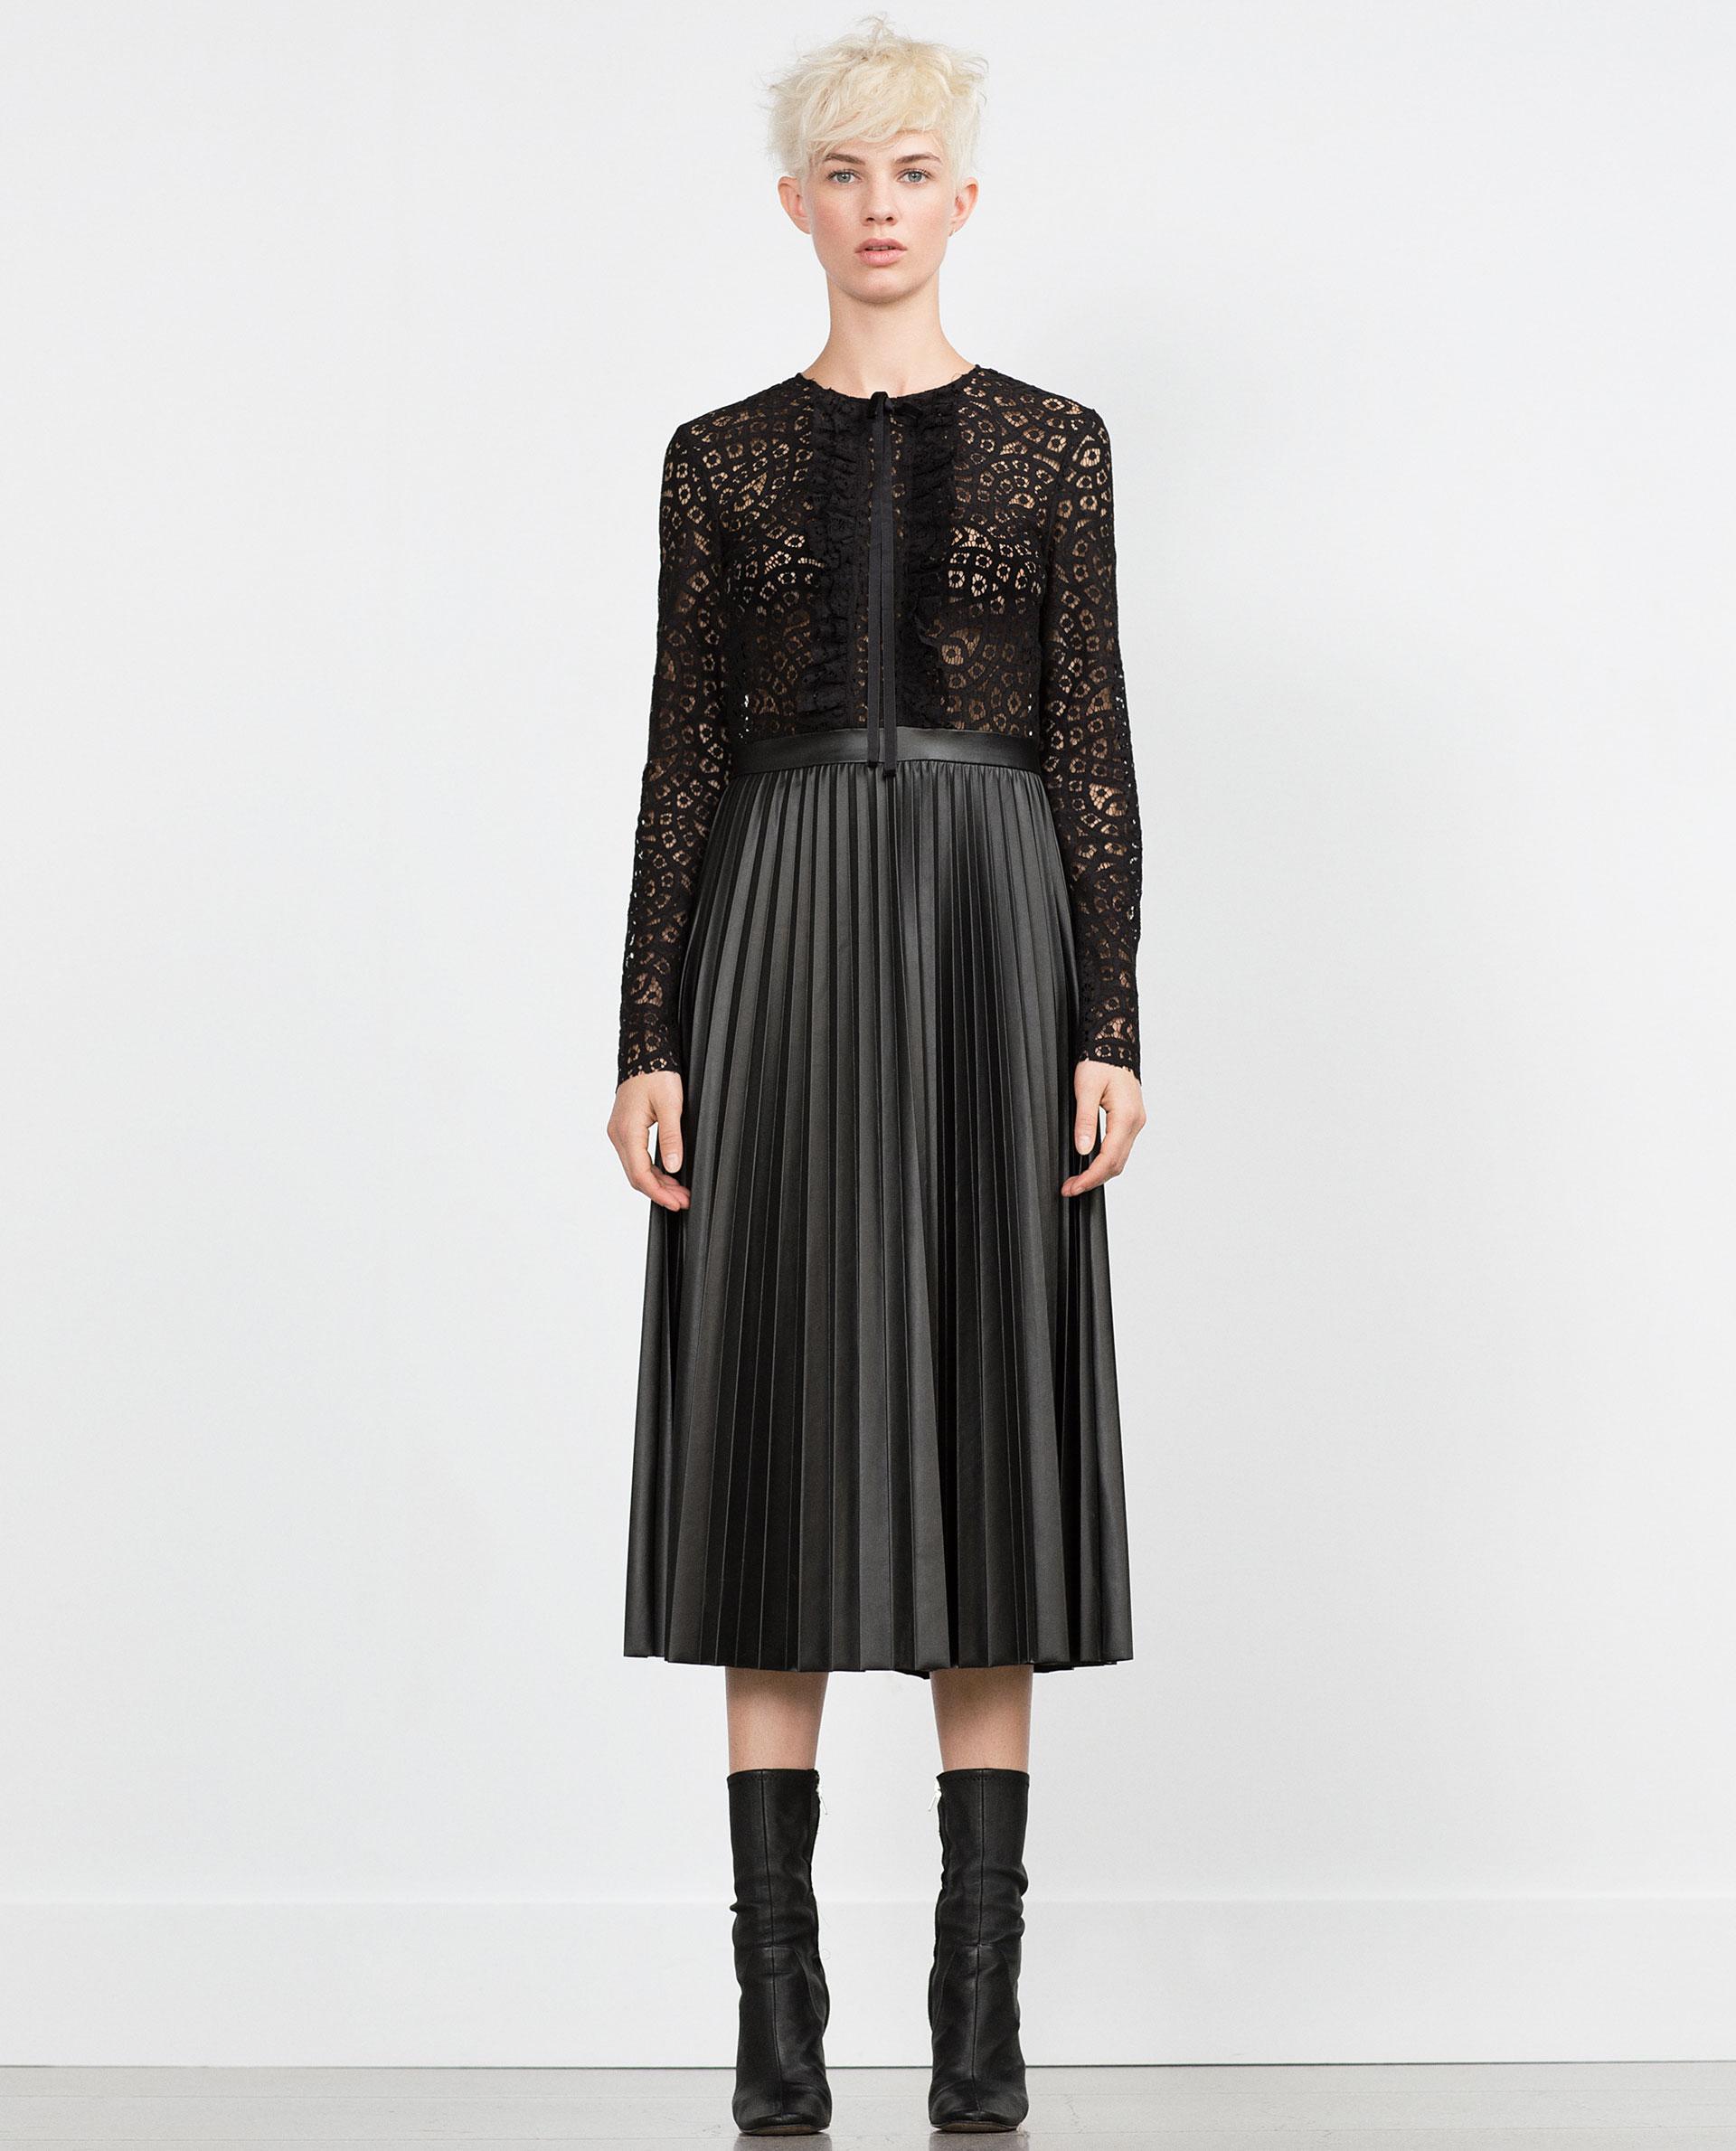 Zara Christmas Holiday Dress Style Domination